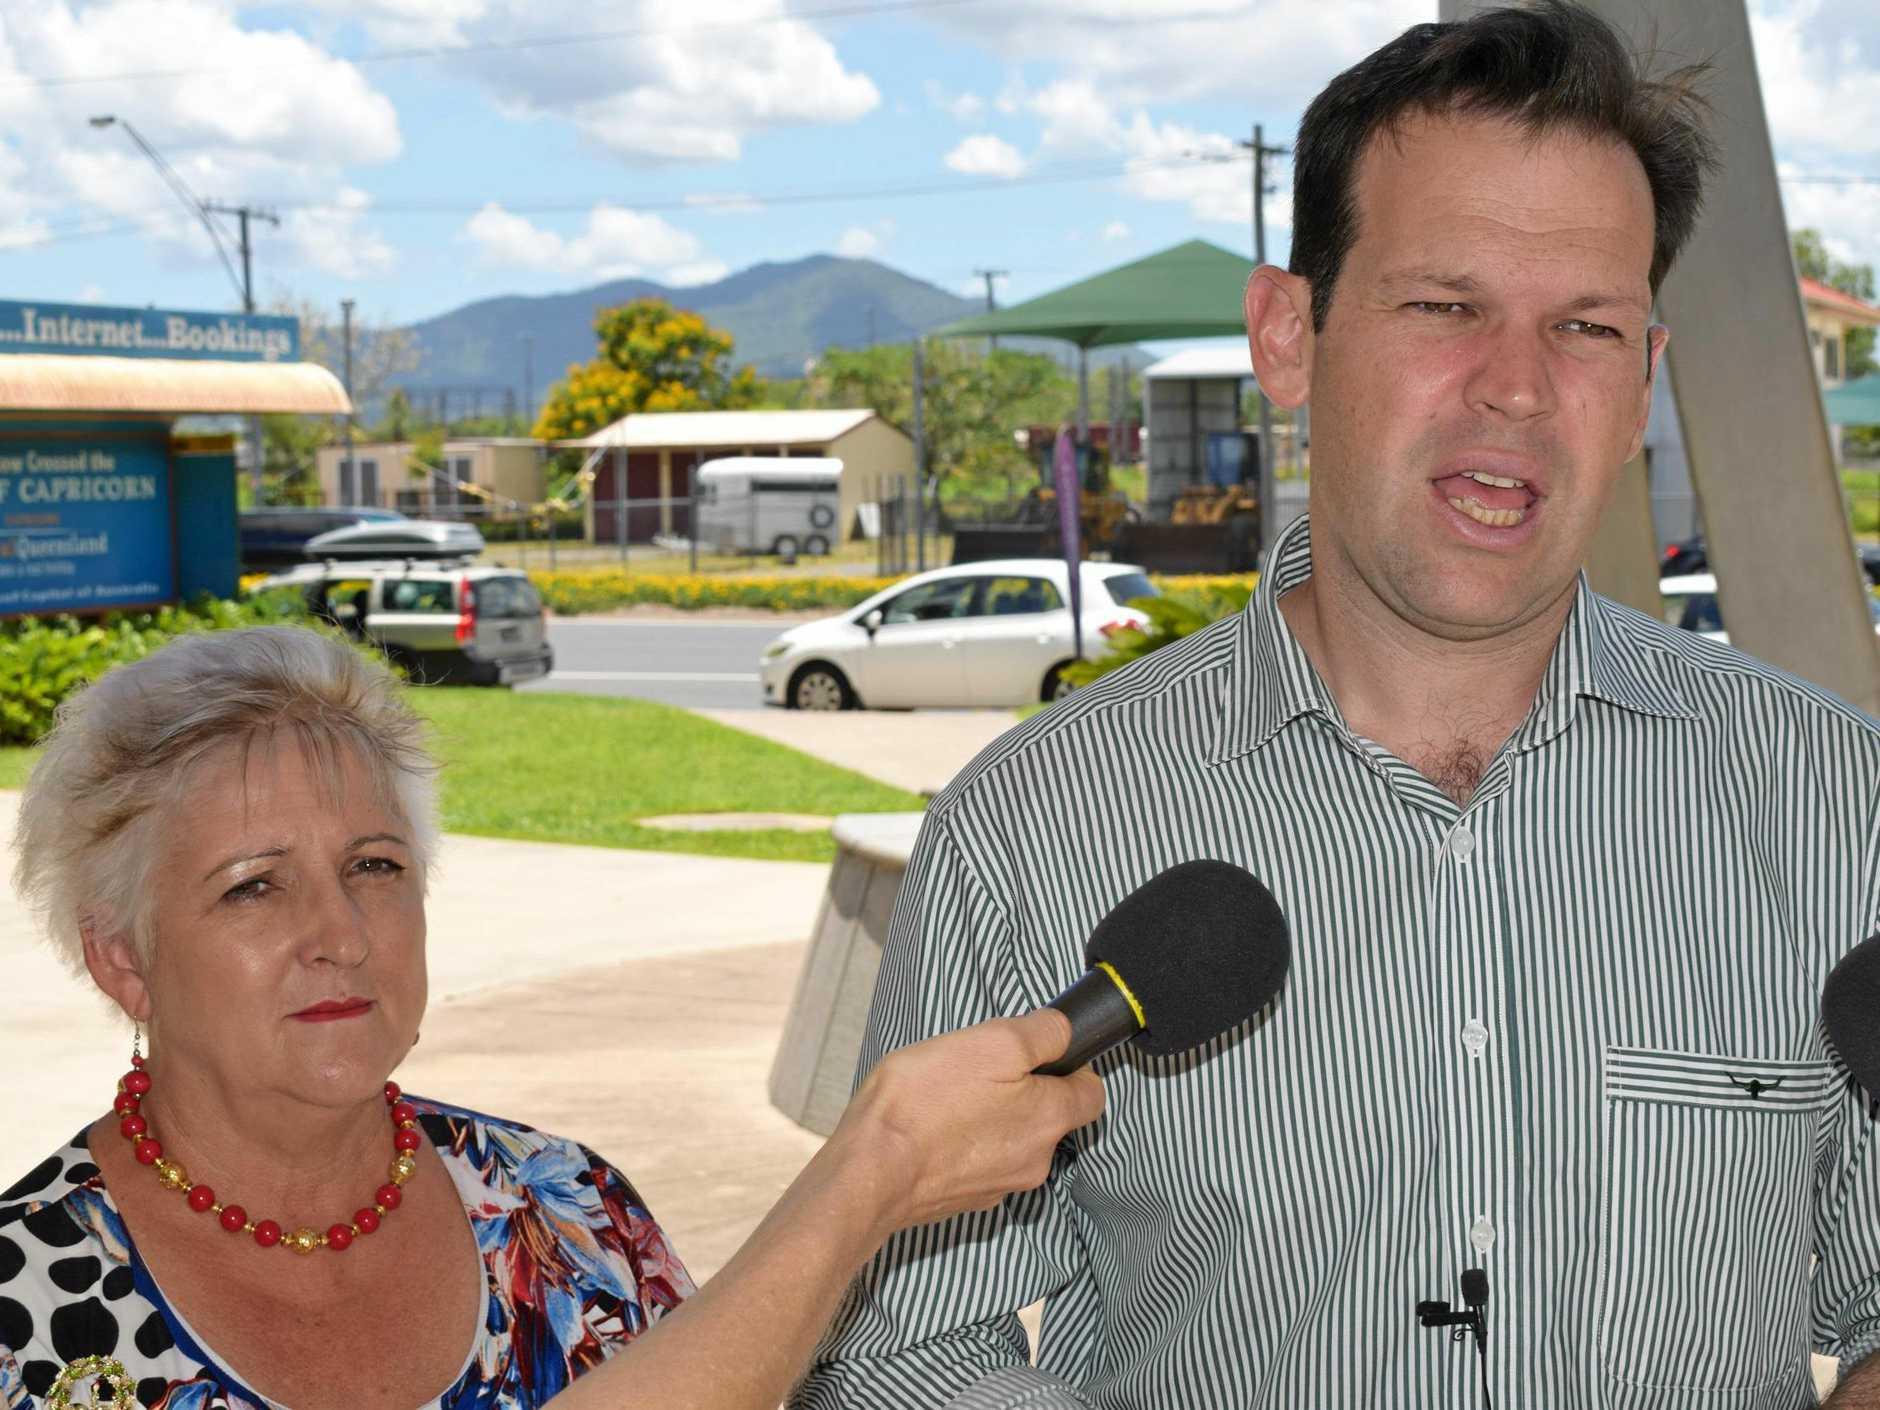 LABOR CHALLENGED: LNP's Senator Matt Canavan and Capricornia MP Michelle Landry have attacked Labor's commitment to regional roads funding.